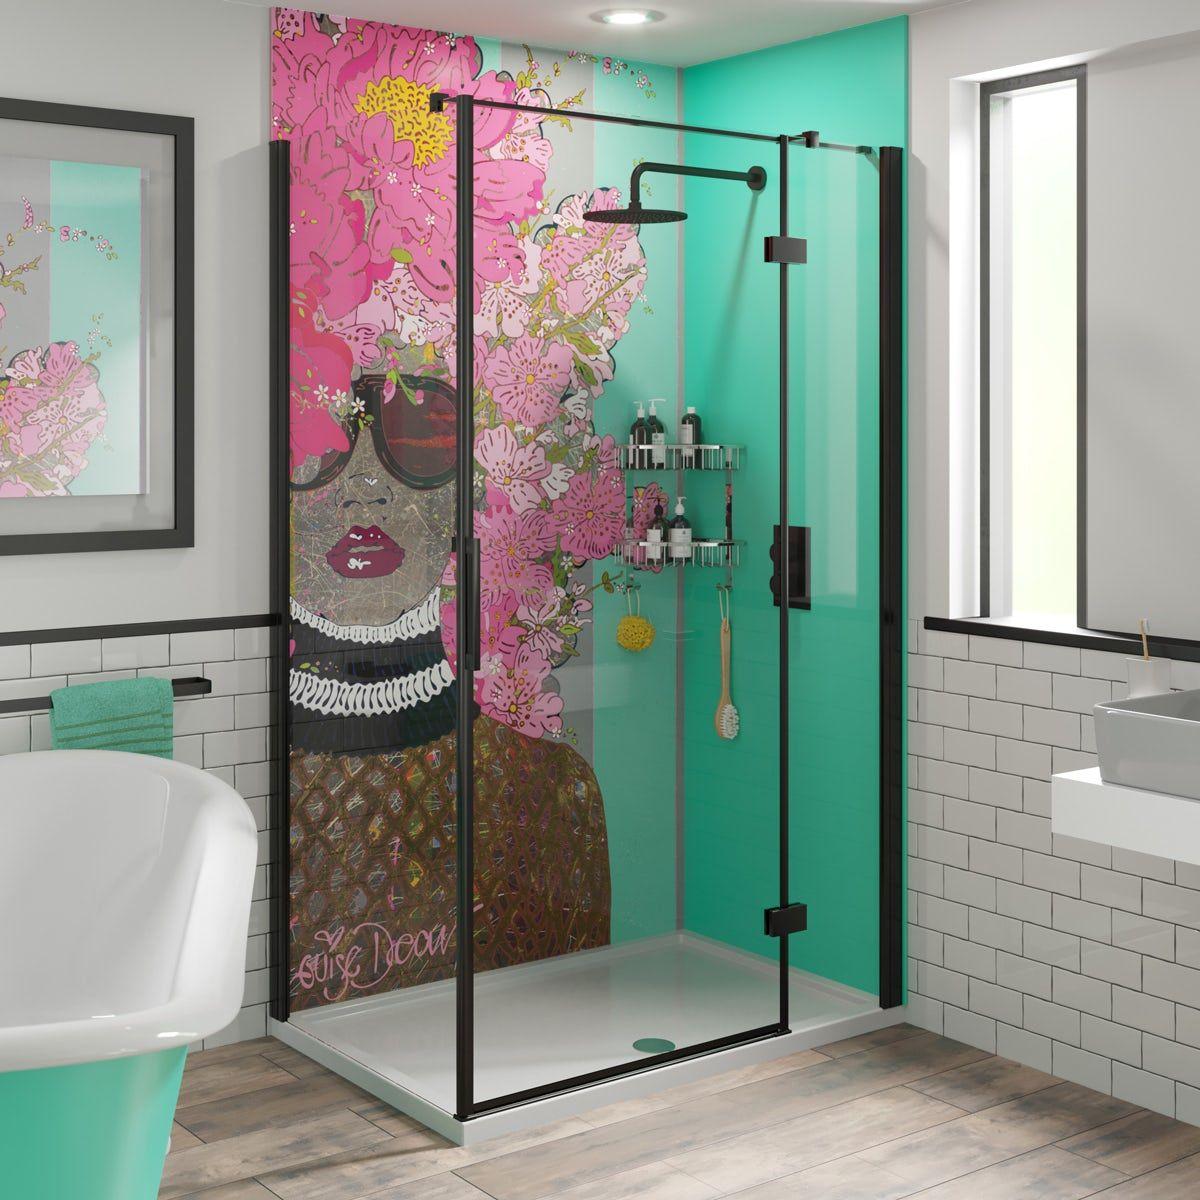 louise dear kiss kiss bam bam green acrylic shower wall on shower wall panels id=71125